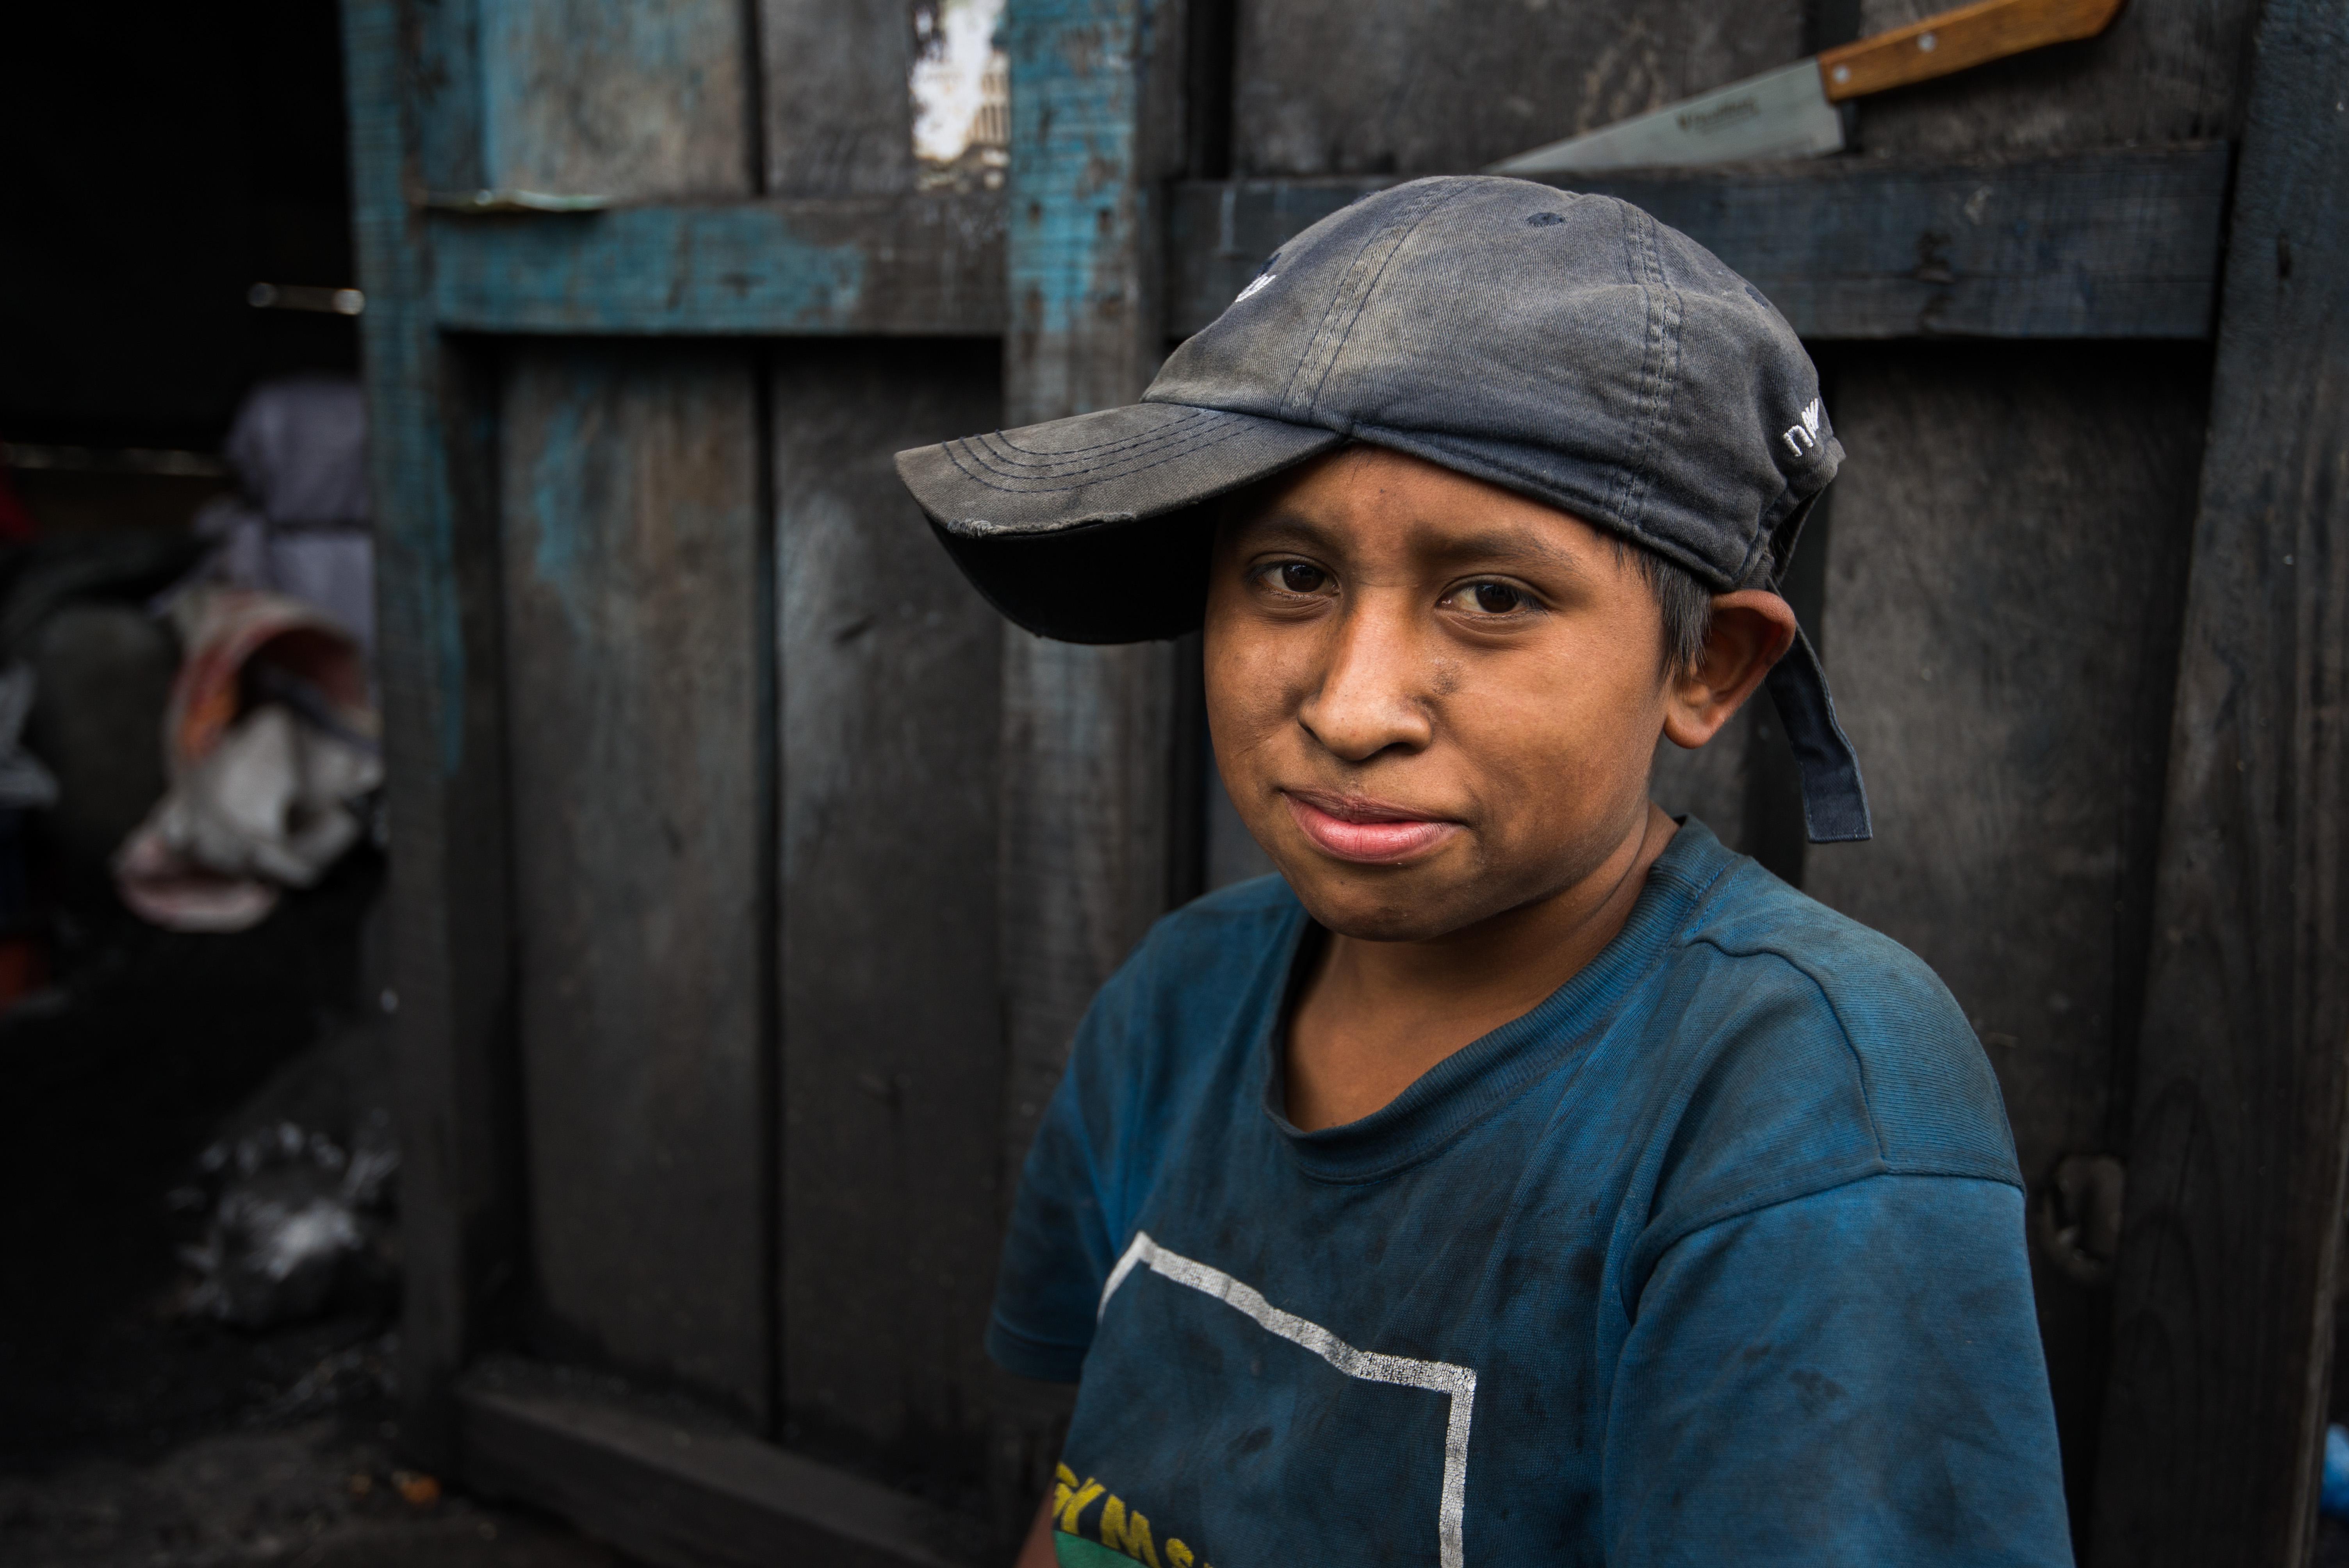 UK Charity photographer